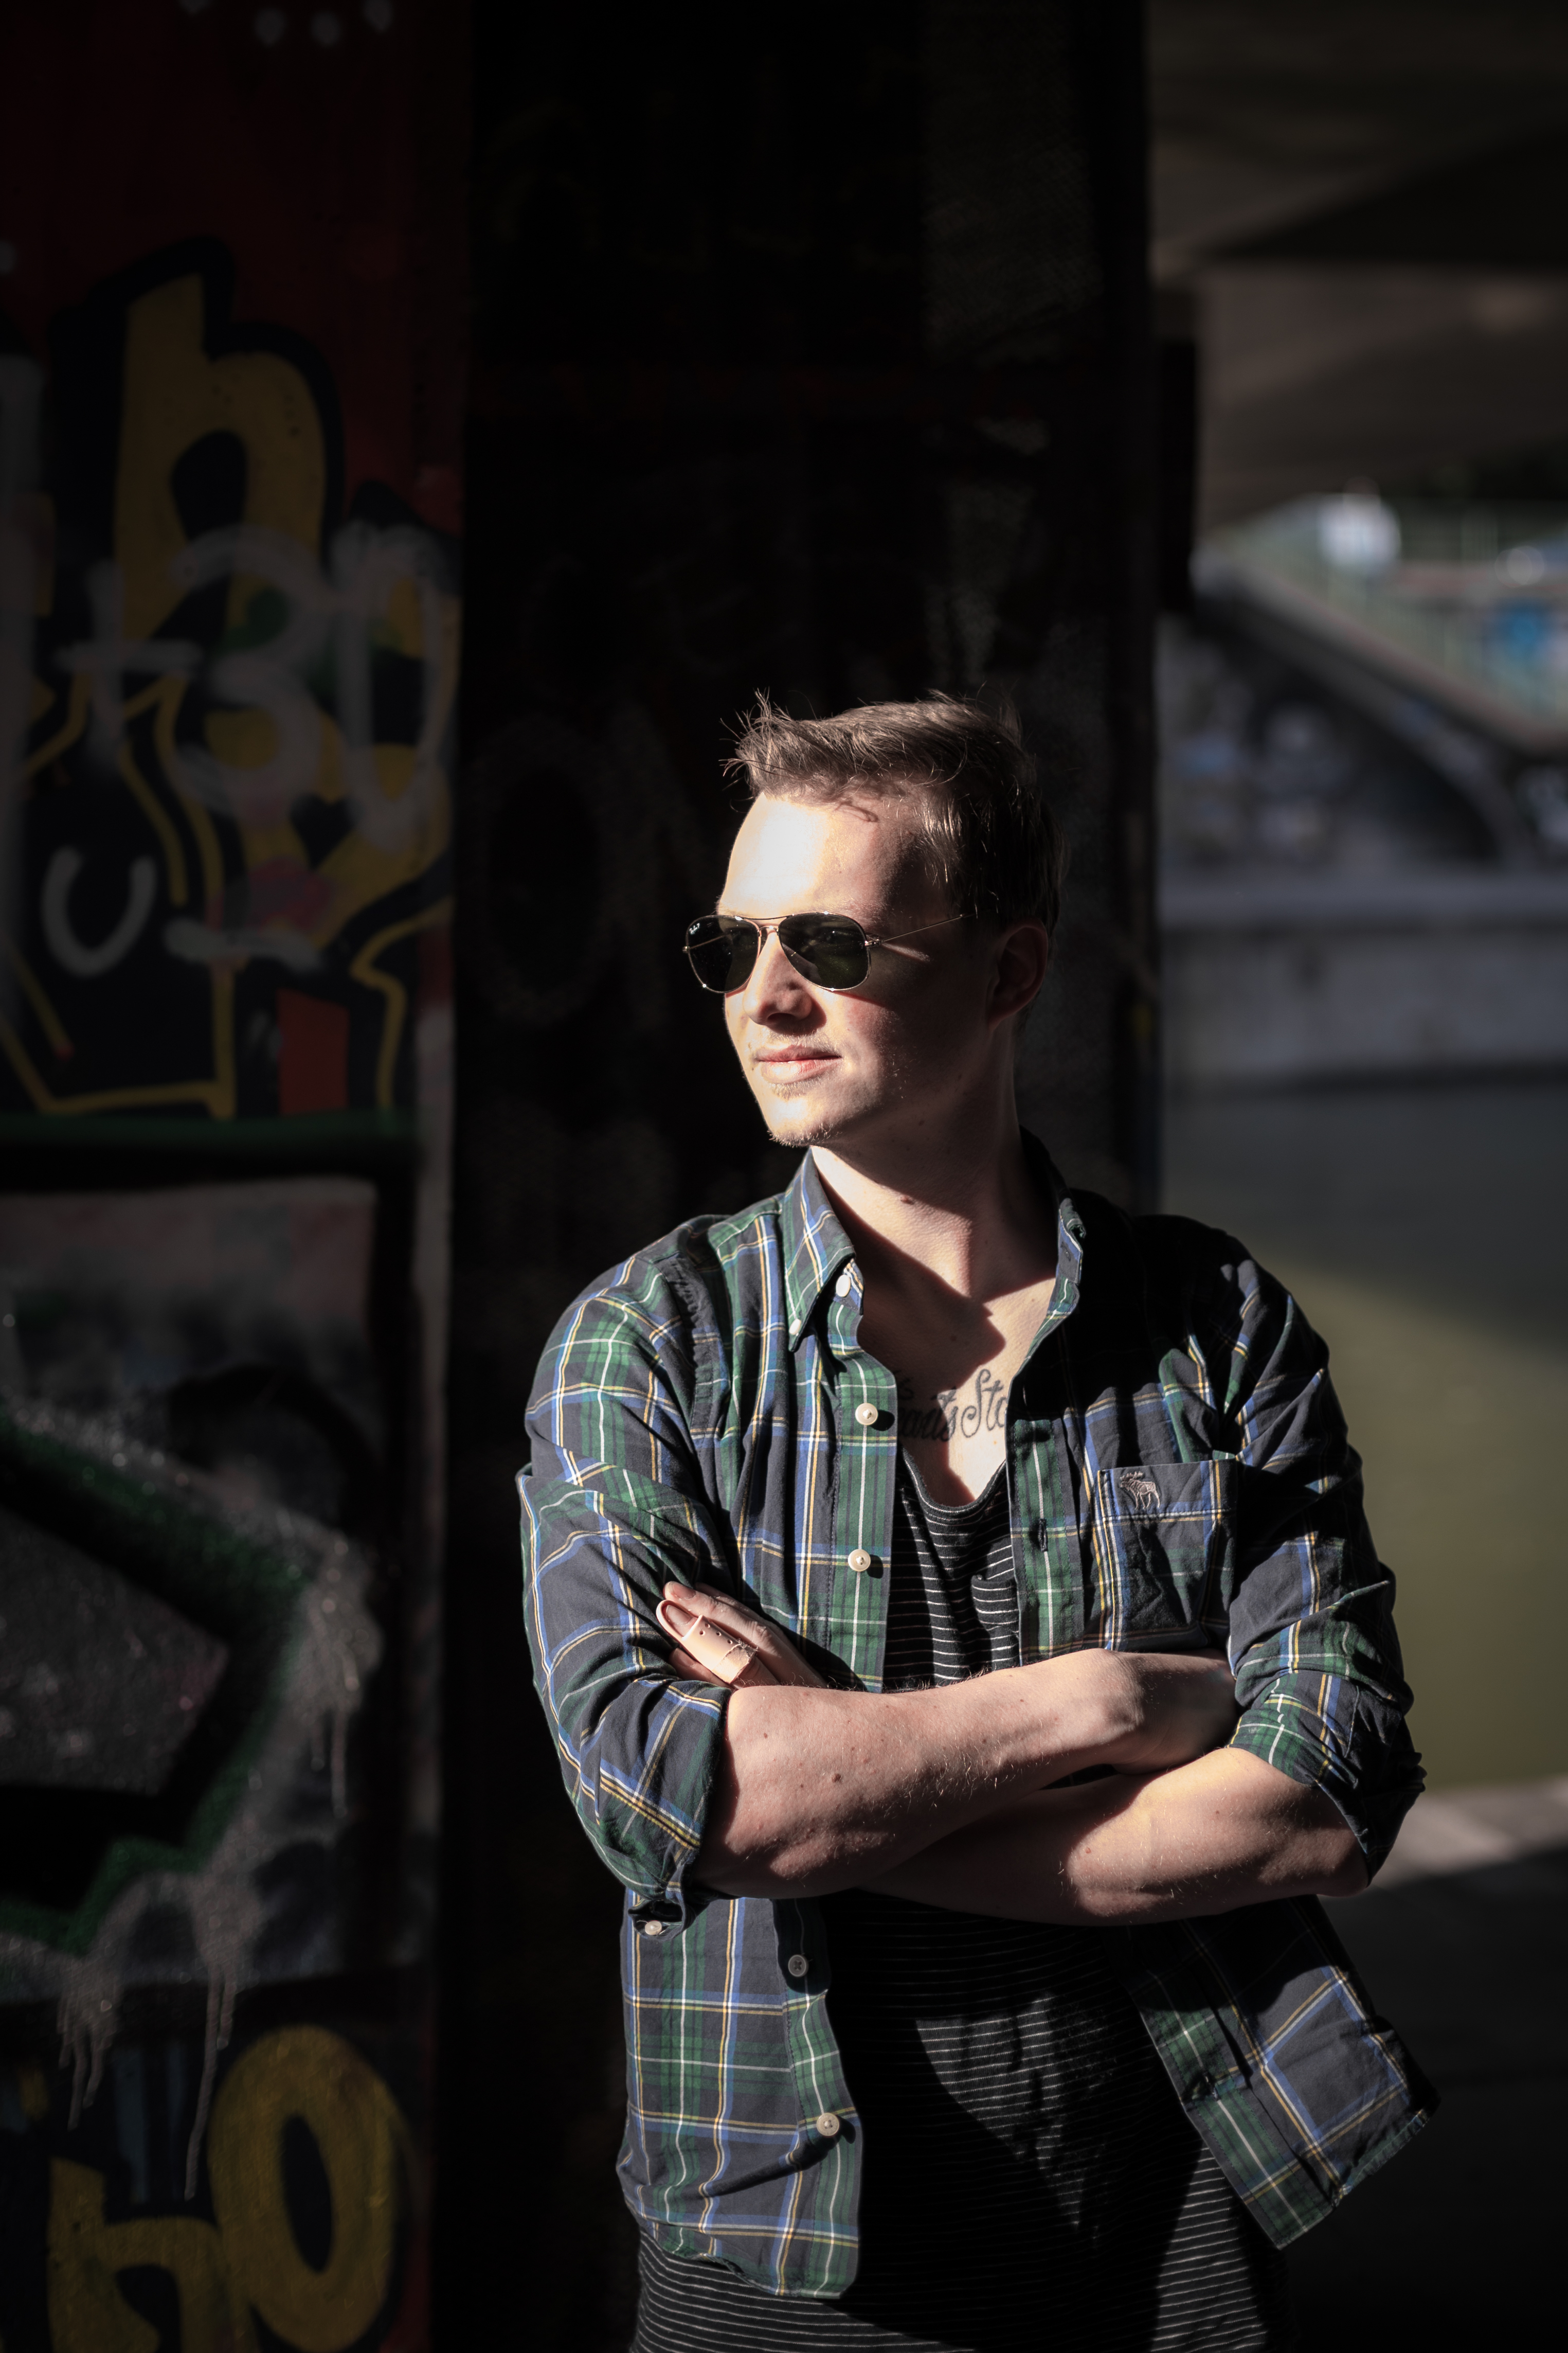 Konrad Fux - Kommunikationsexperte und Kommunikationsberater